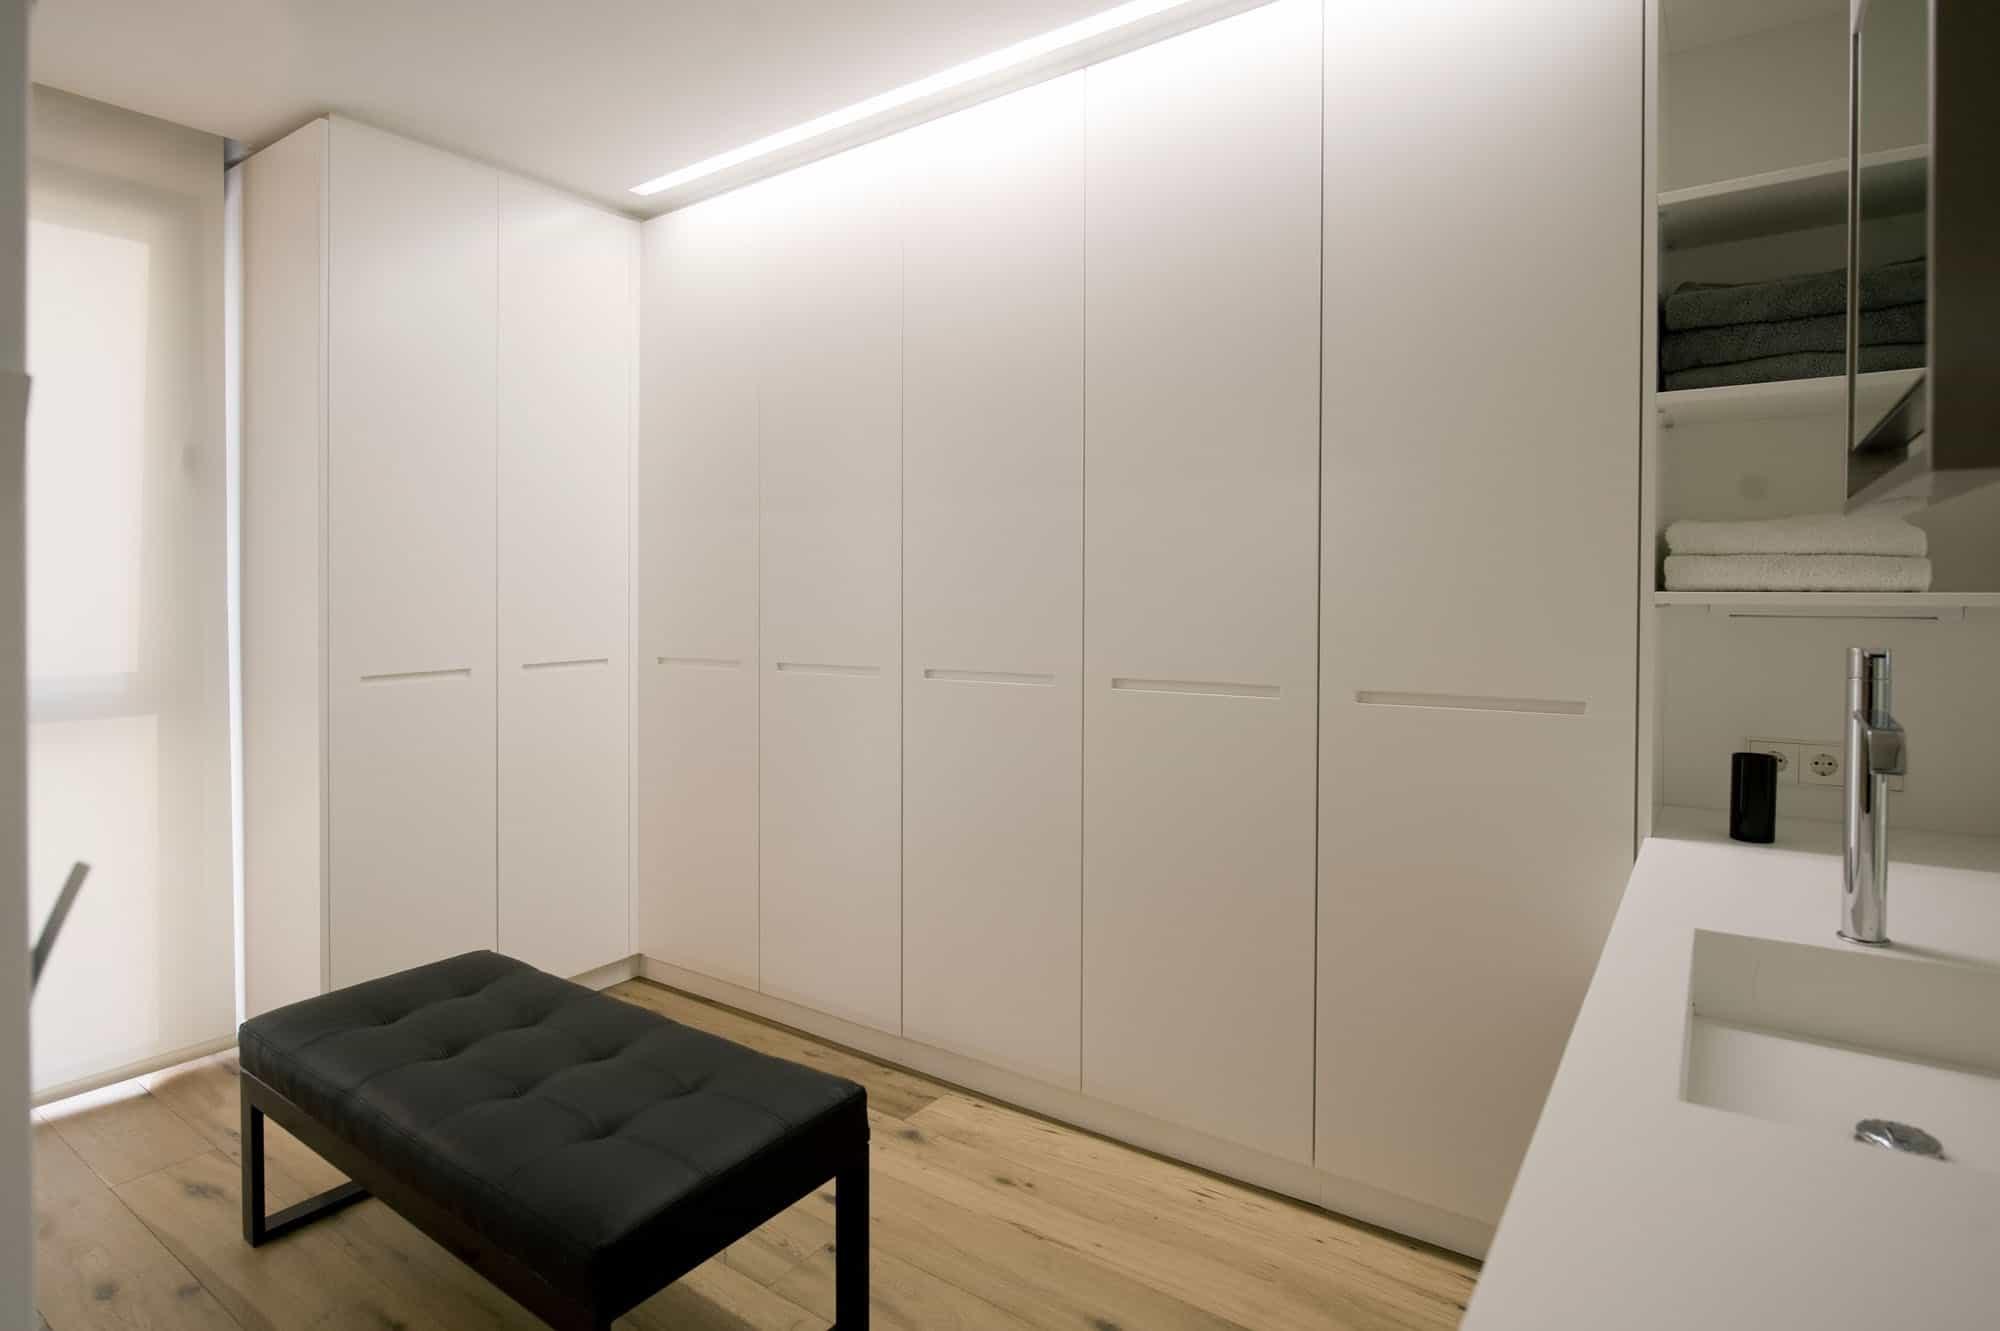 HI-MACS Doble Dueto Apartment by Cuartopensante (35)